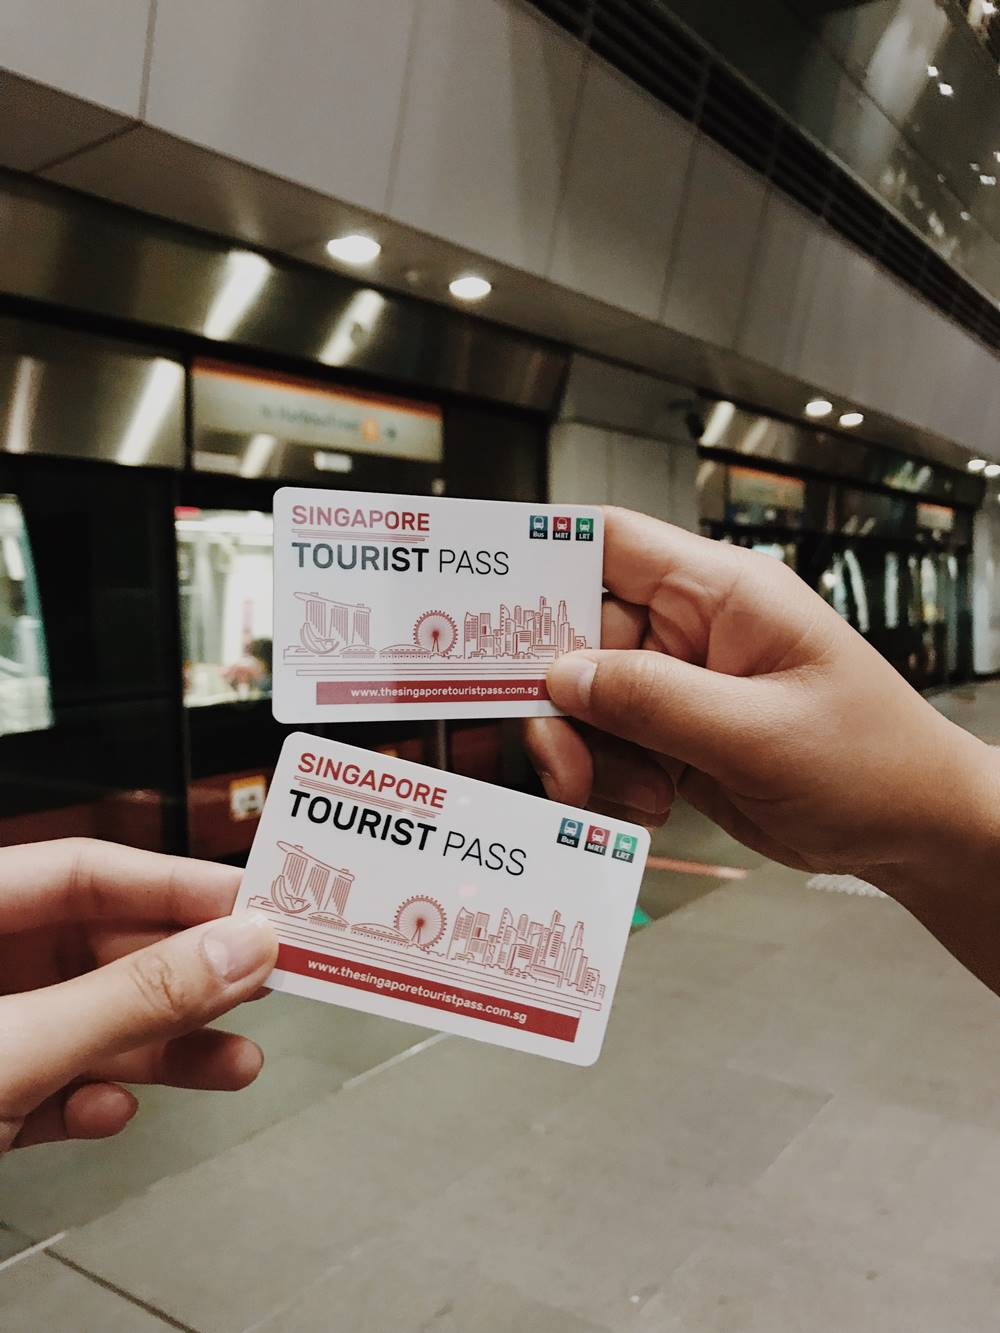 Ilustrasi Singapore Tourist Pass. Photo by Nix Gacasan on Unsplash